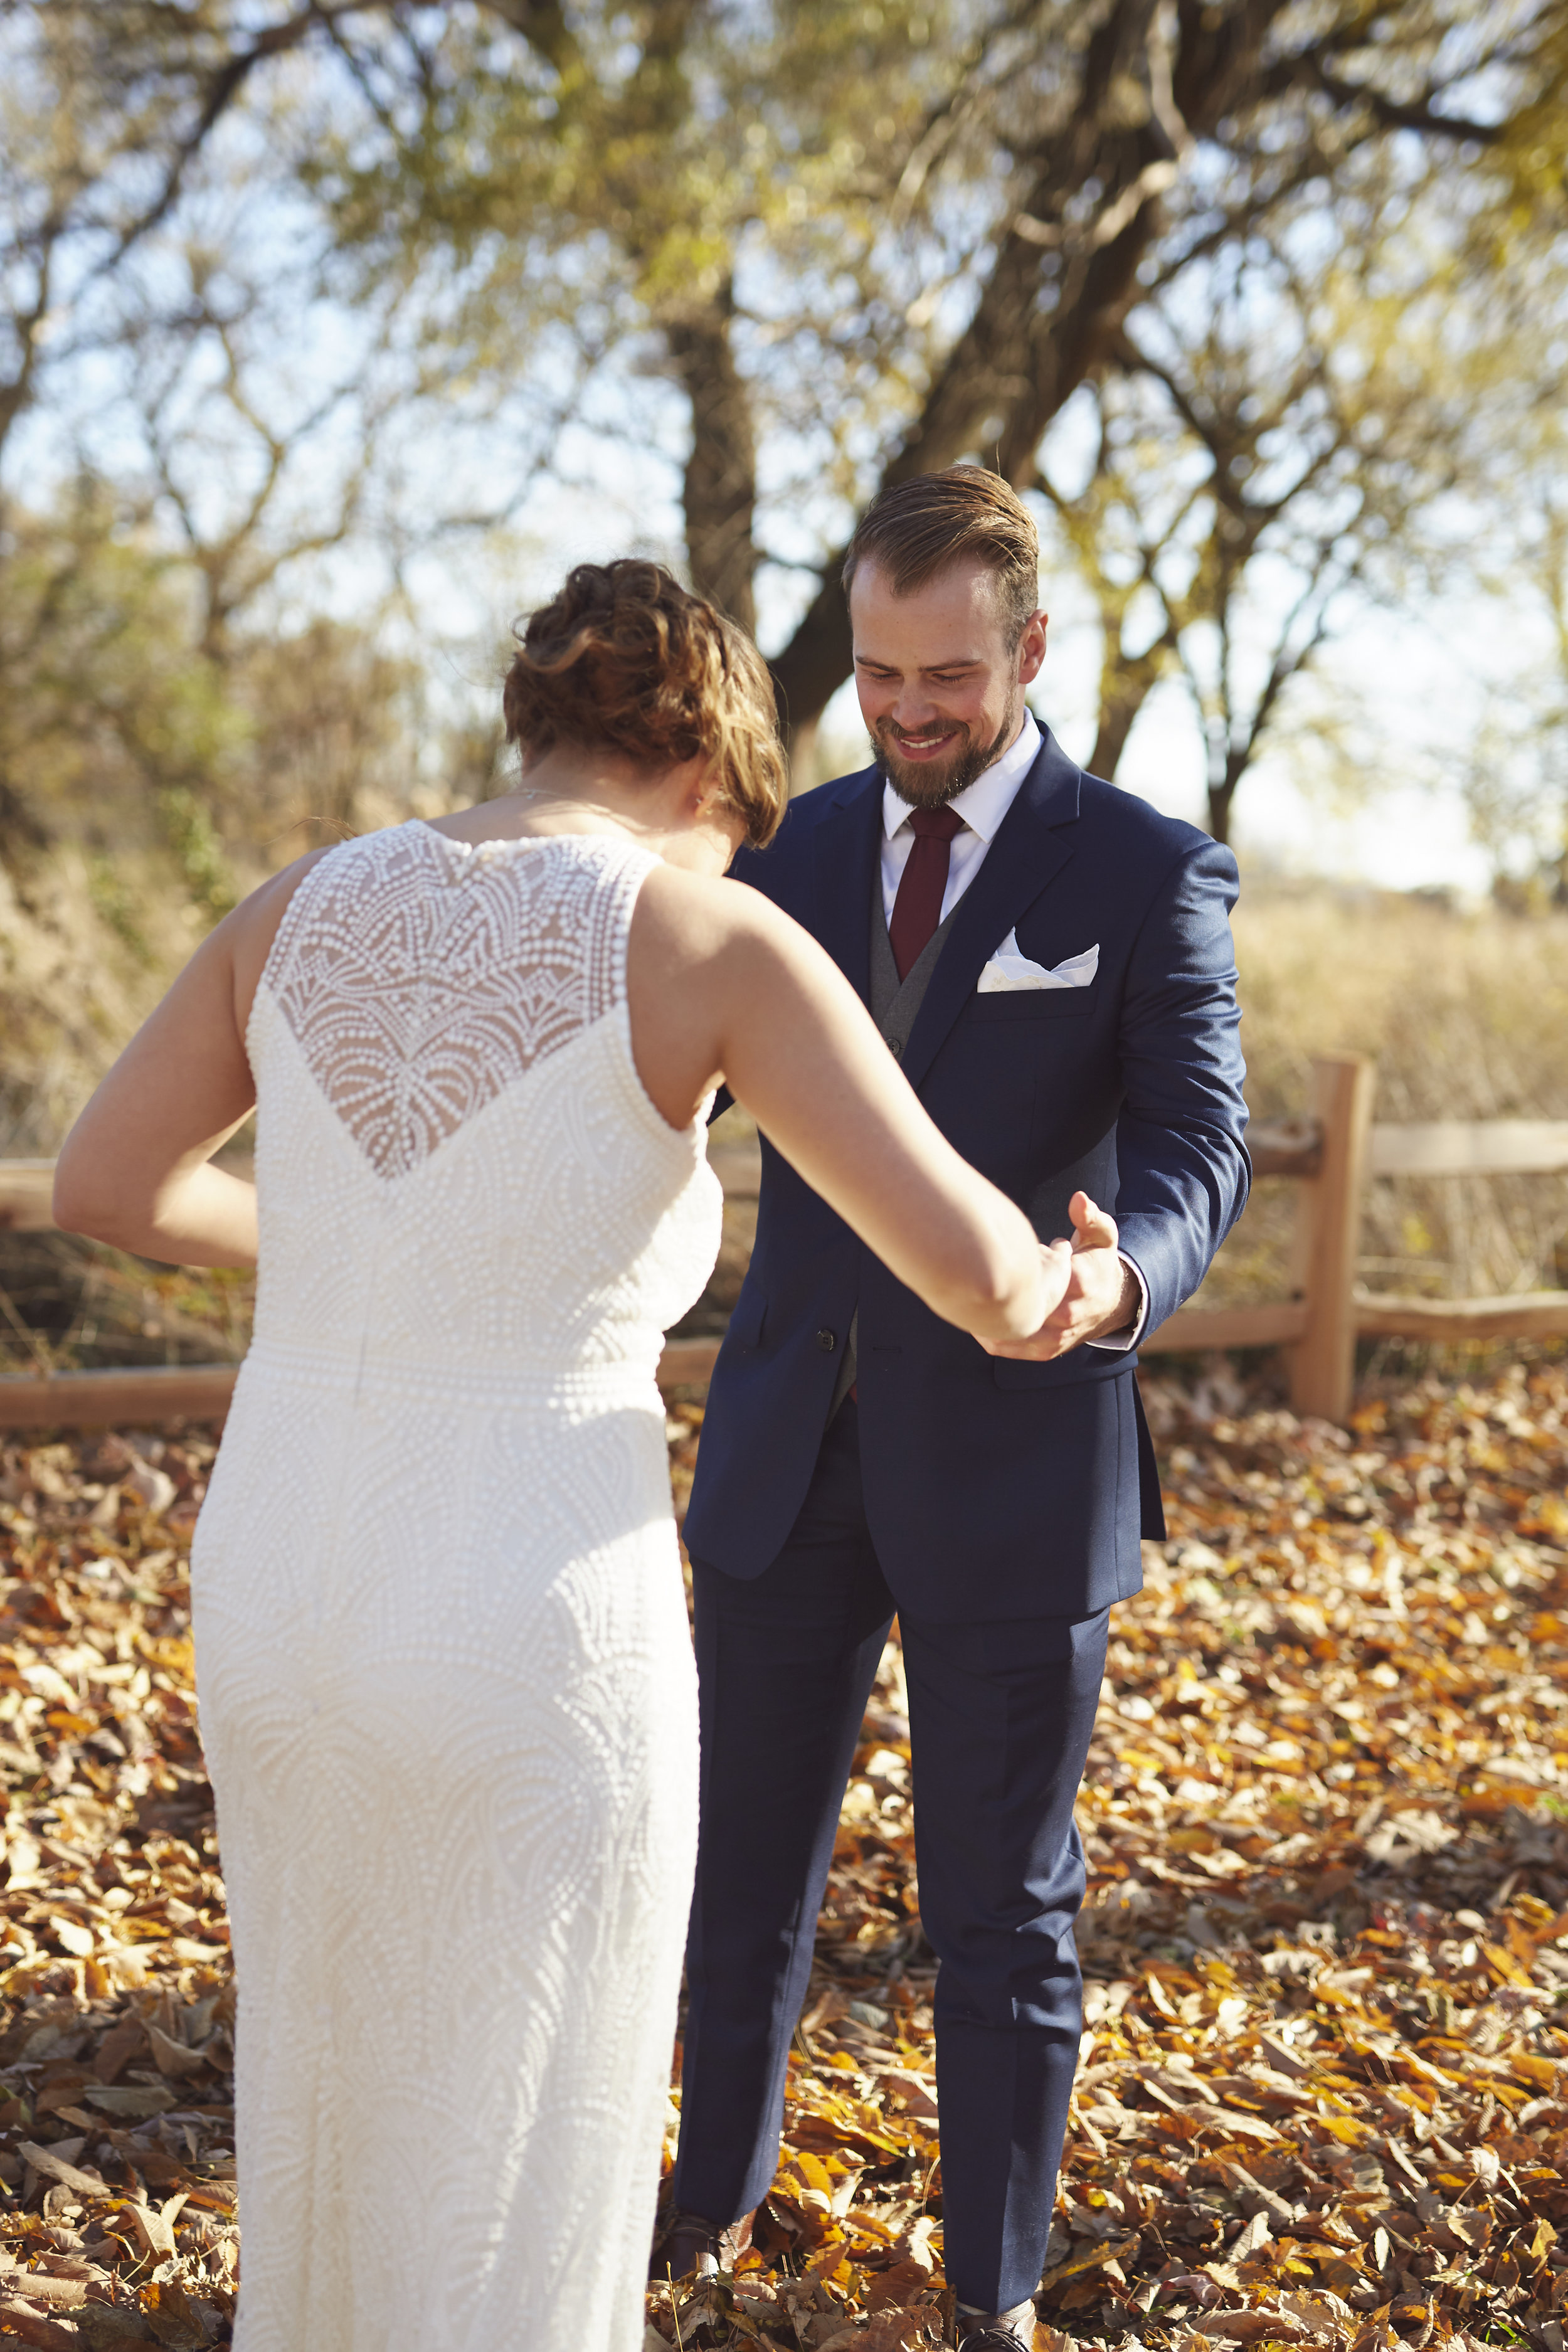 Jen & Ben Wedding - benromangphoto - 6I5A9461.jpg